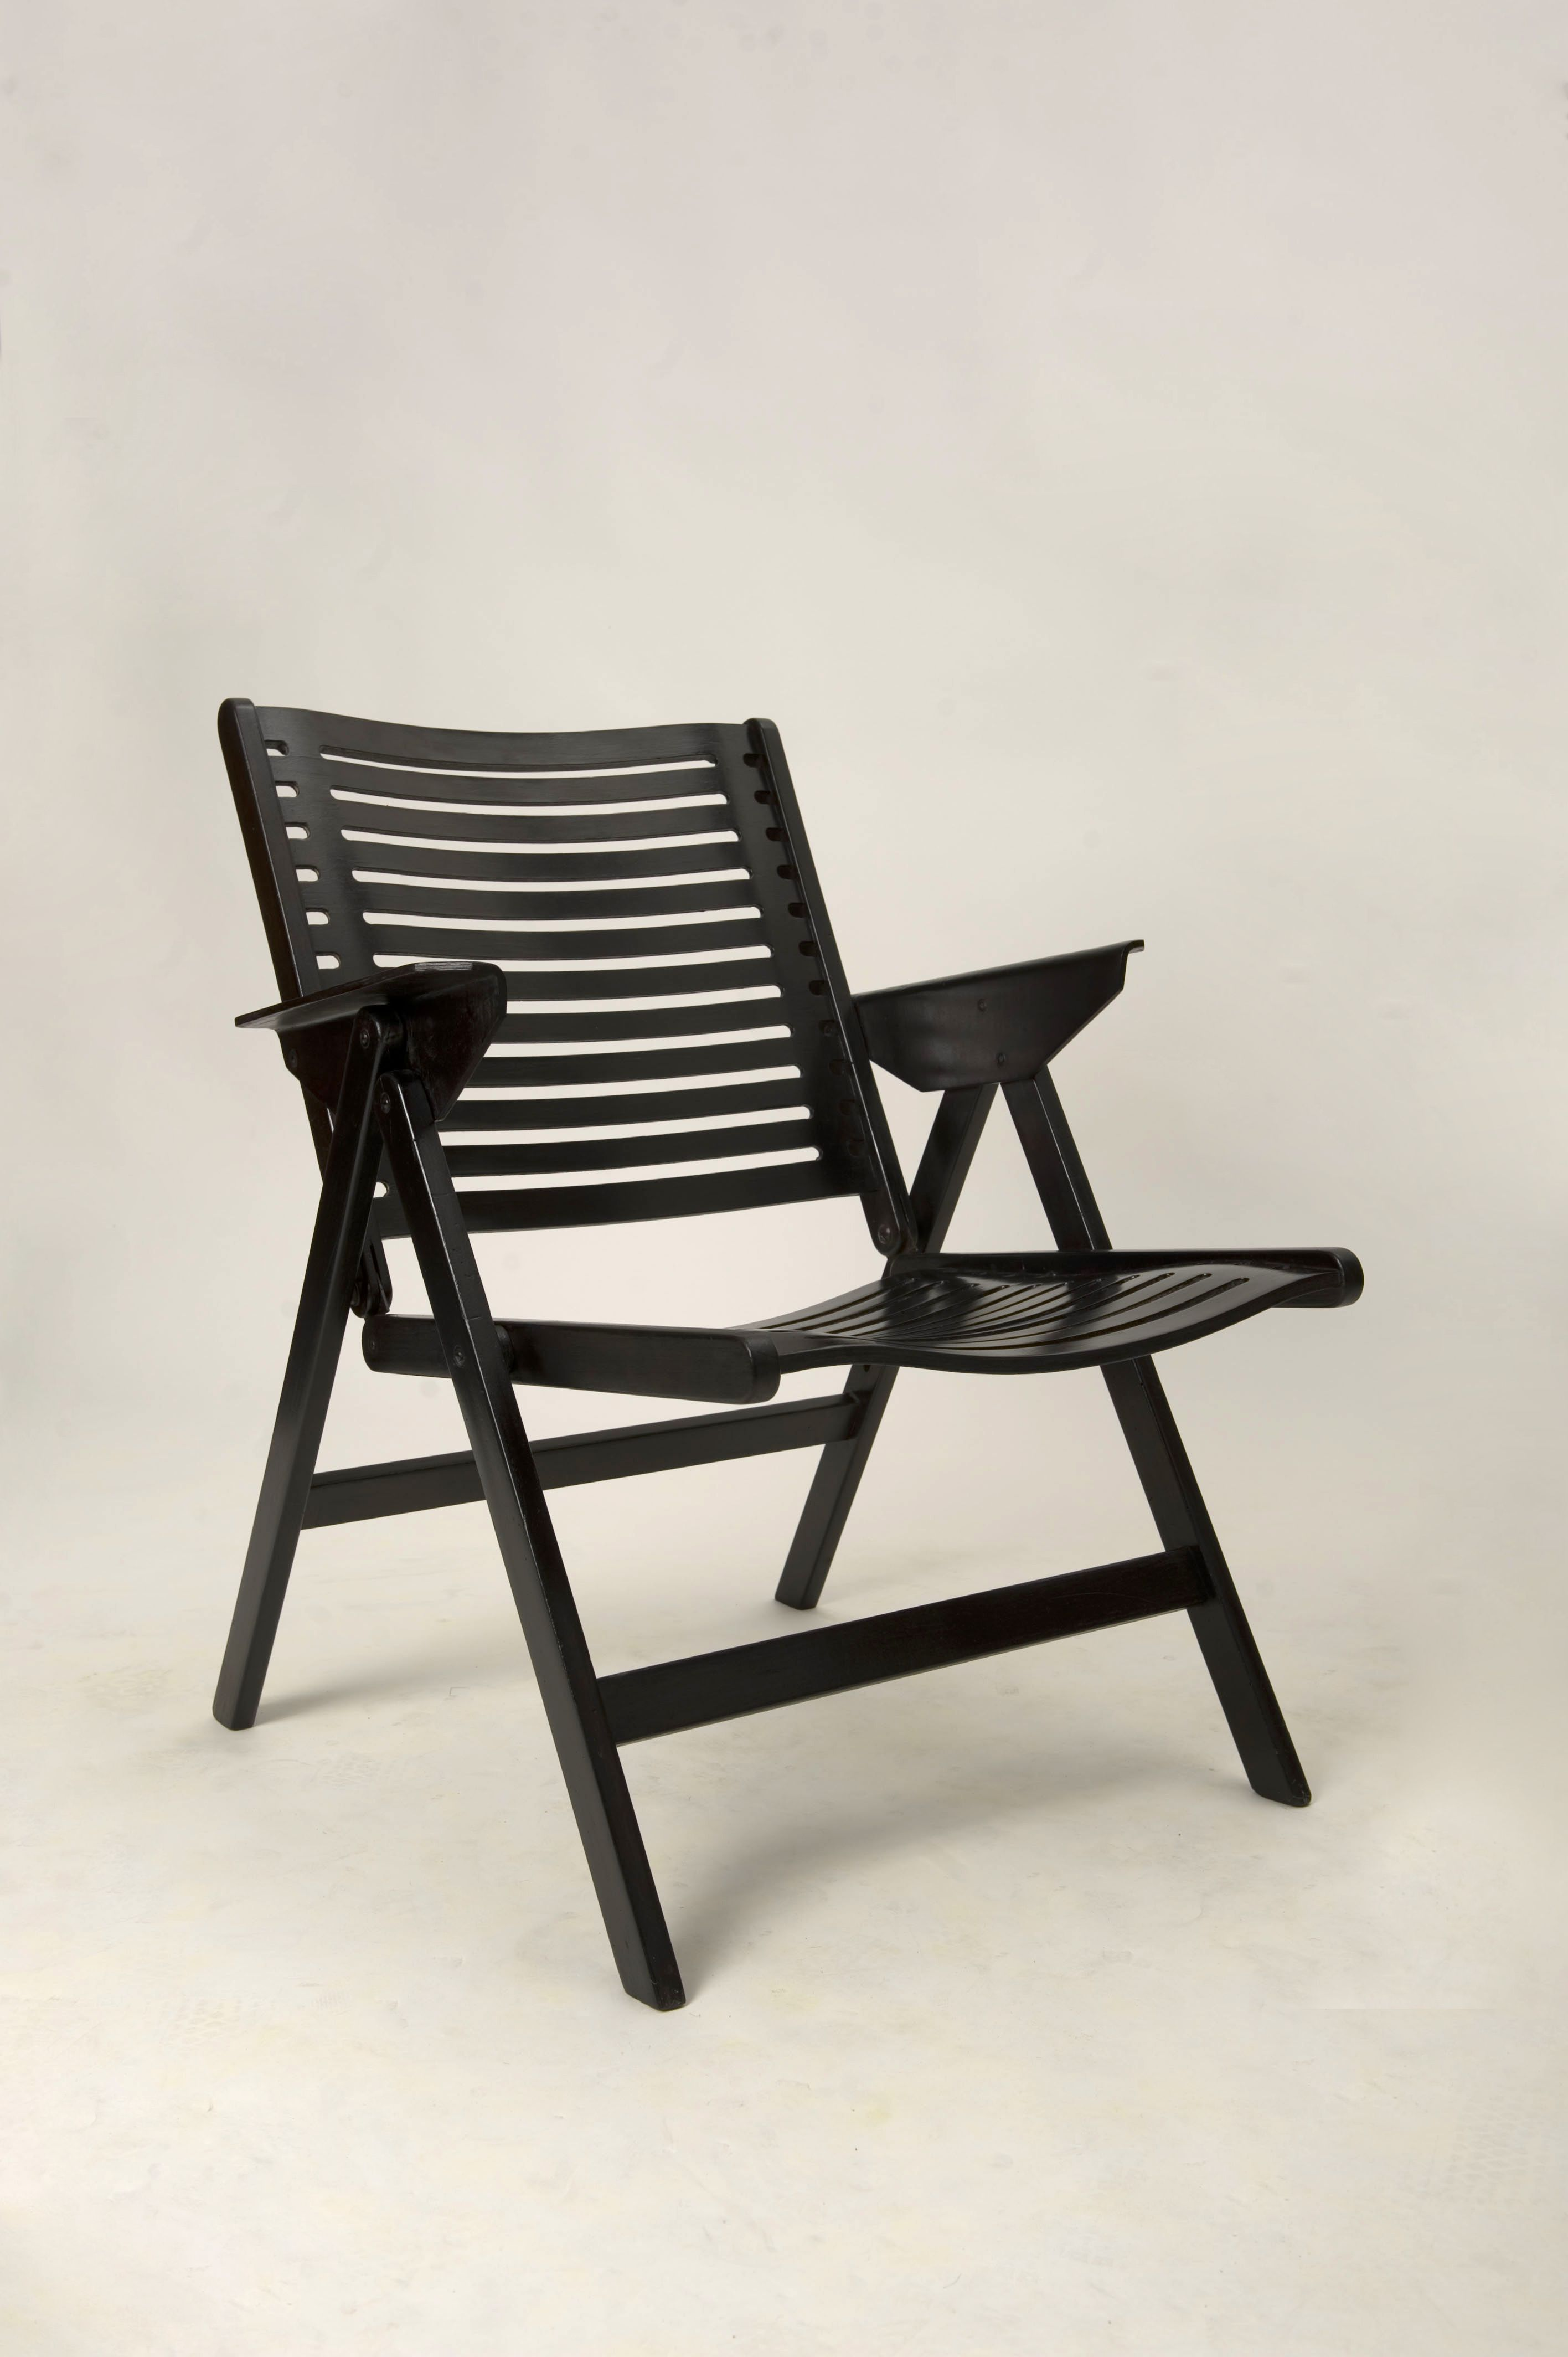 Chair Design Museum Walmart Outdoor Cushions The Quotrex Quot Is A Scandinavian Inspired Wooden